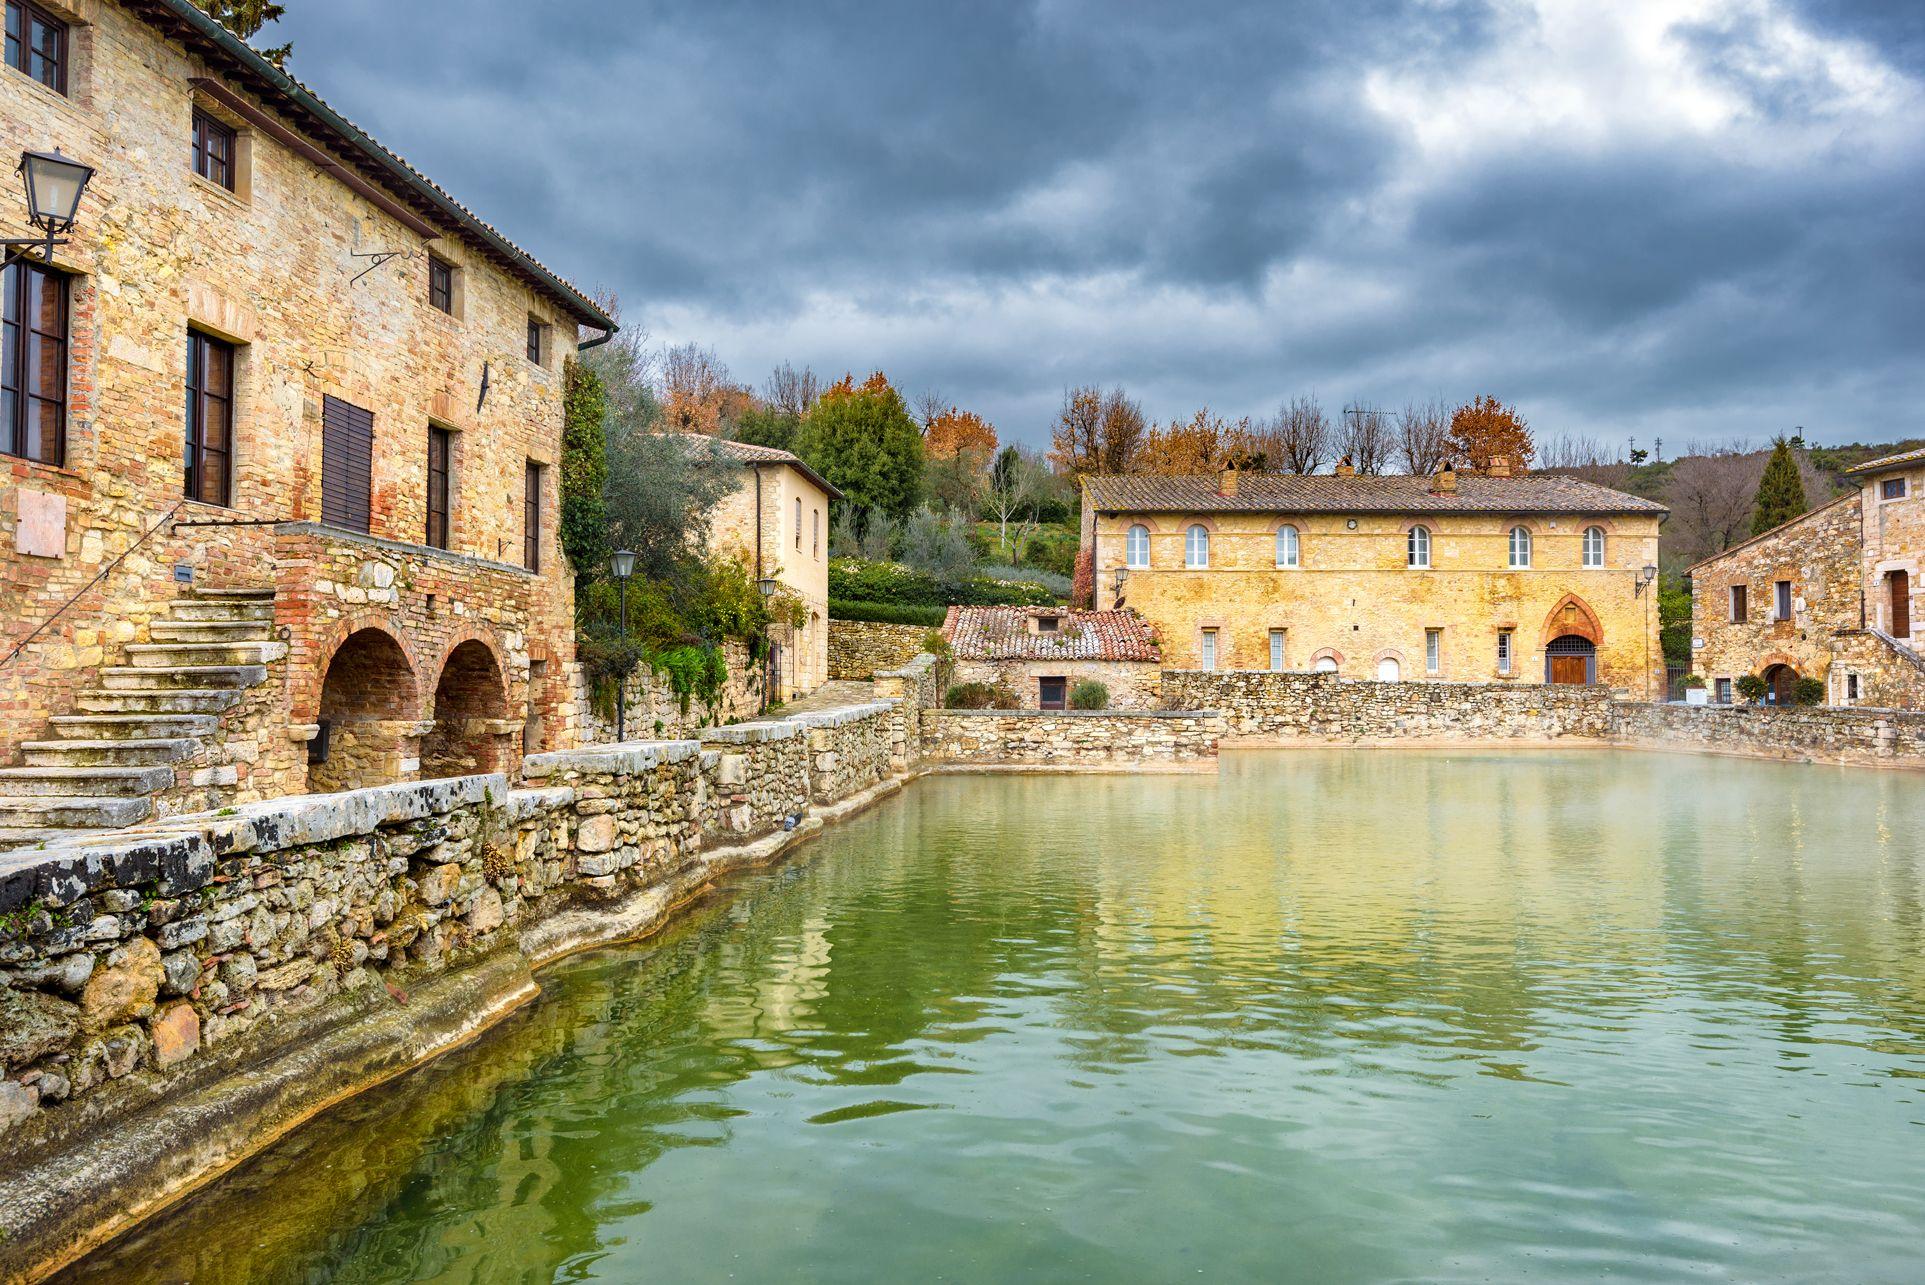 Bagno Vignoni a Siena Siena, Italia, Bagno